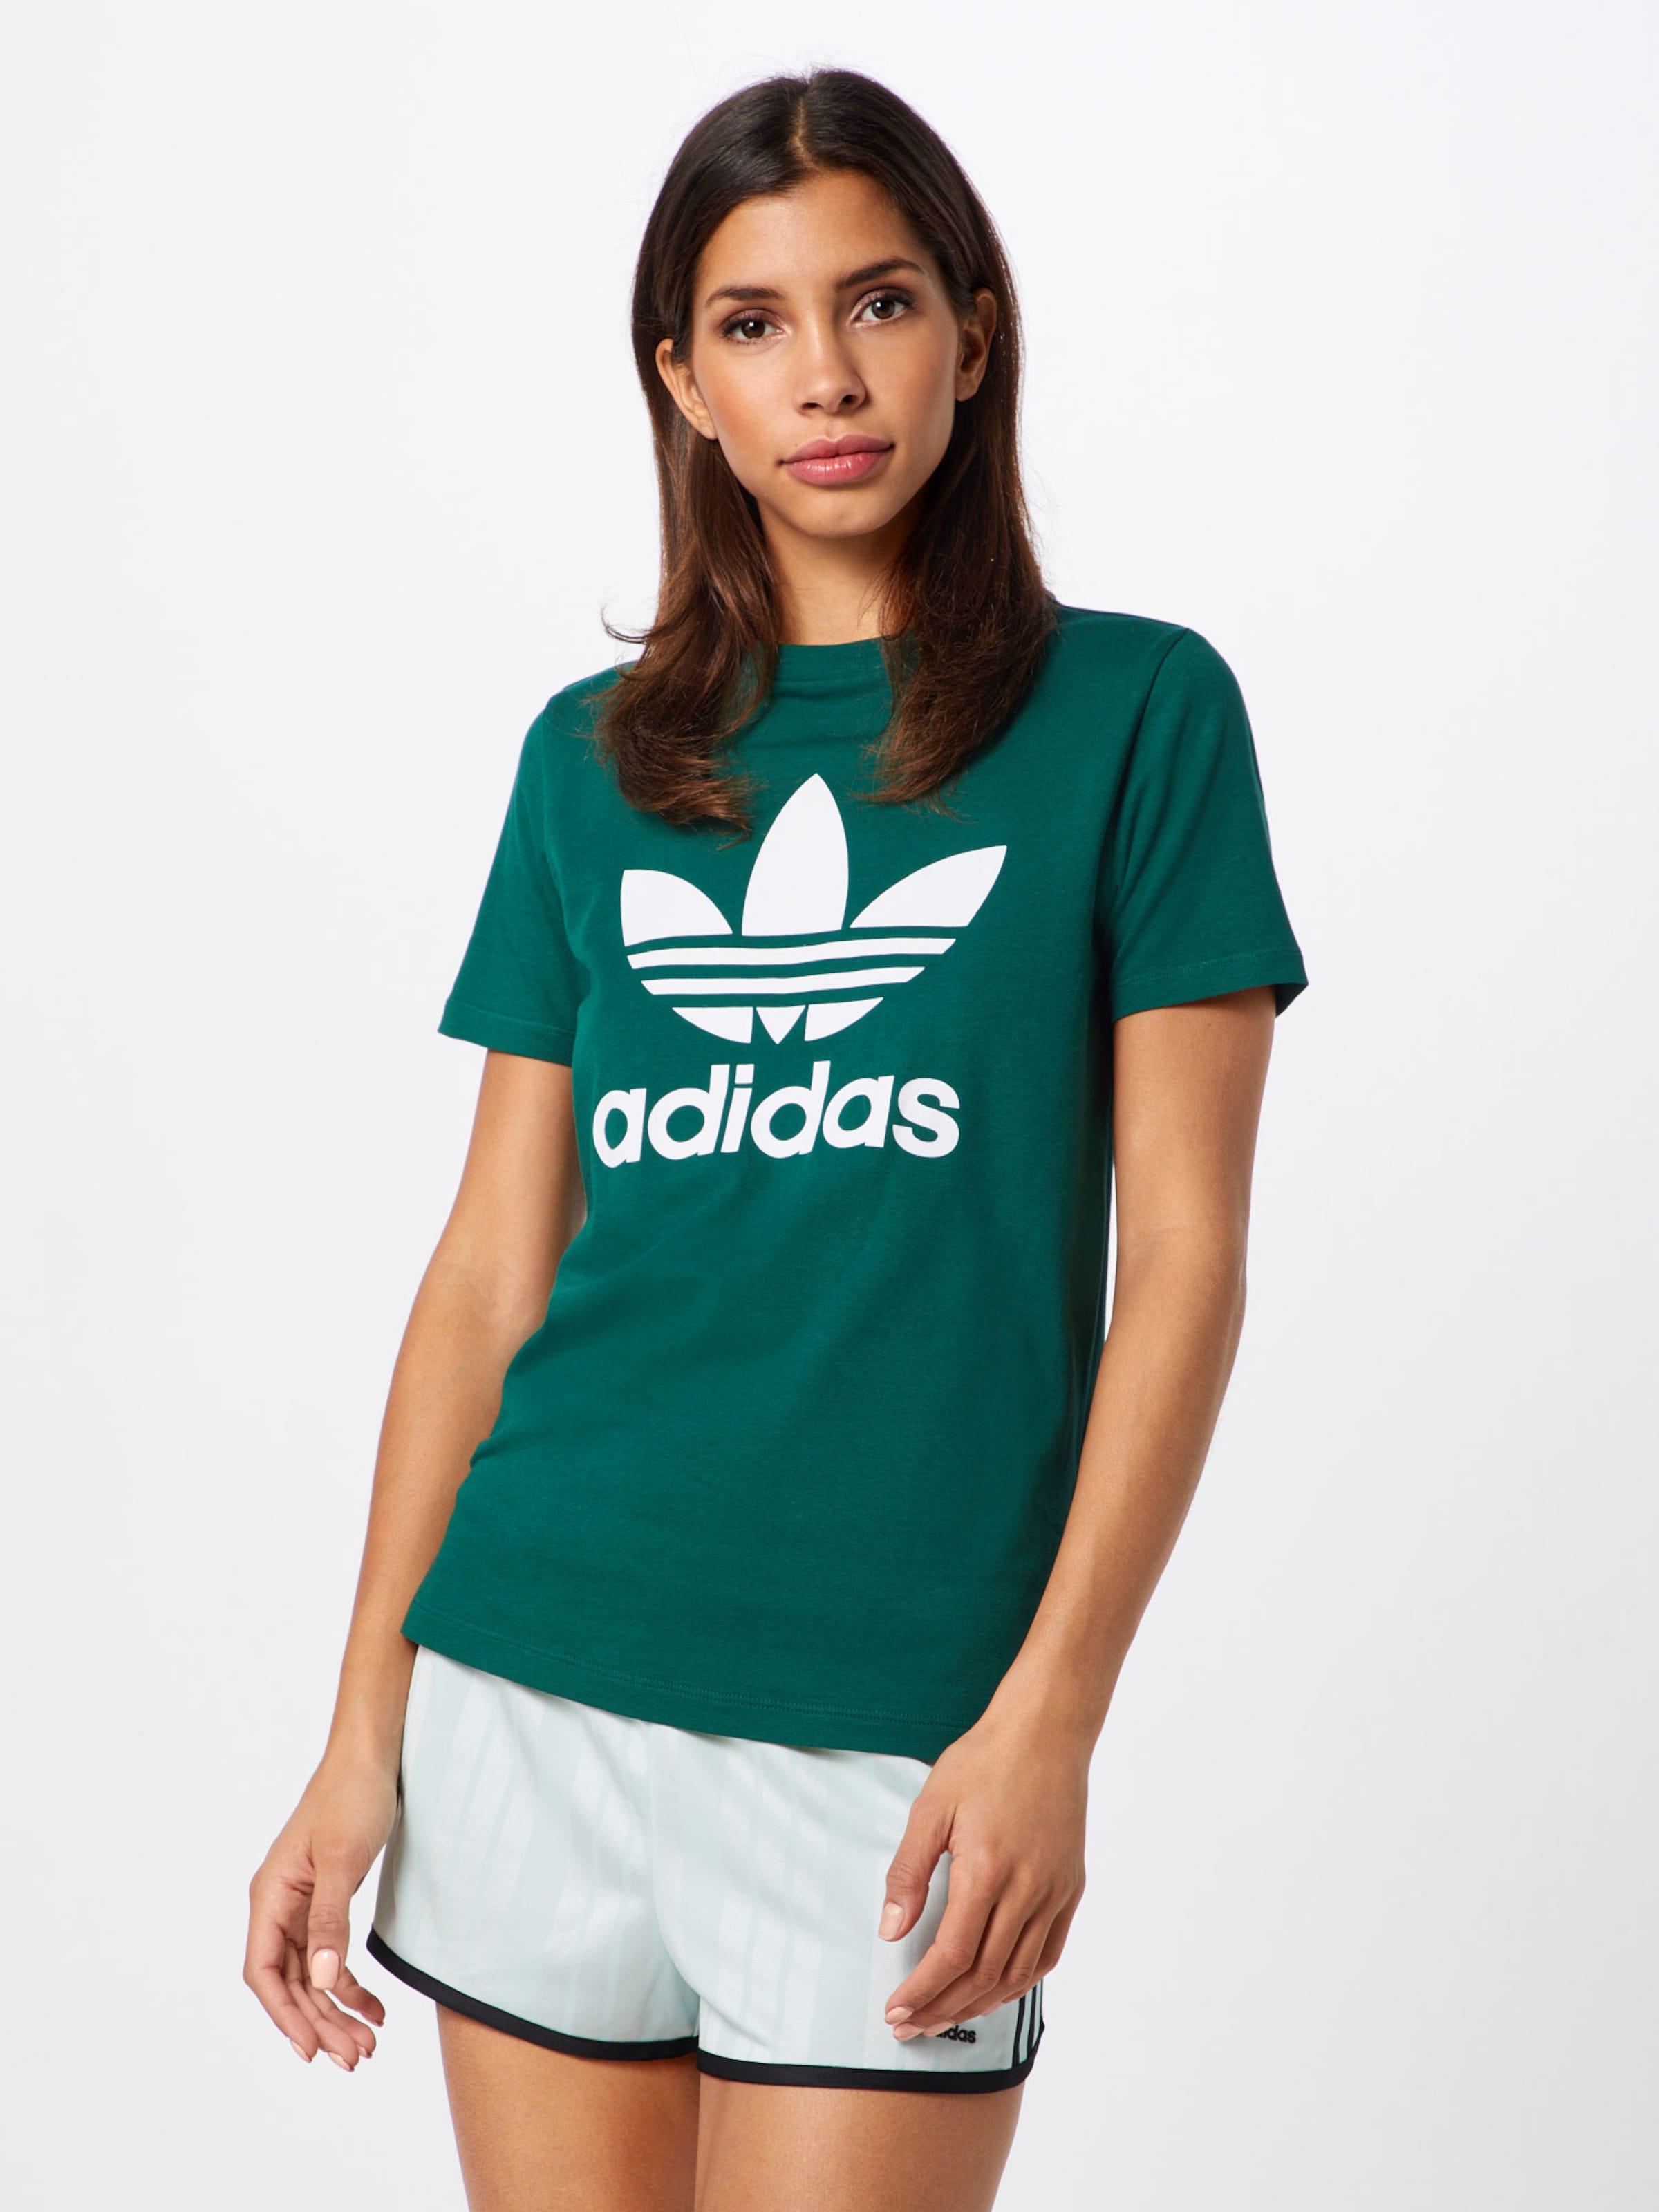 Adidas Originals Shirt In 'trefoil' GroenWit 8Pk0nXOw